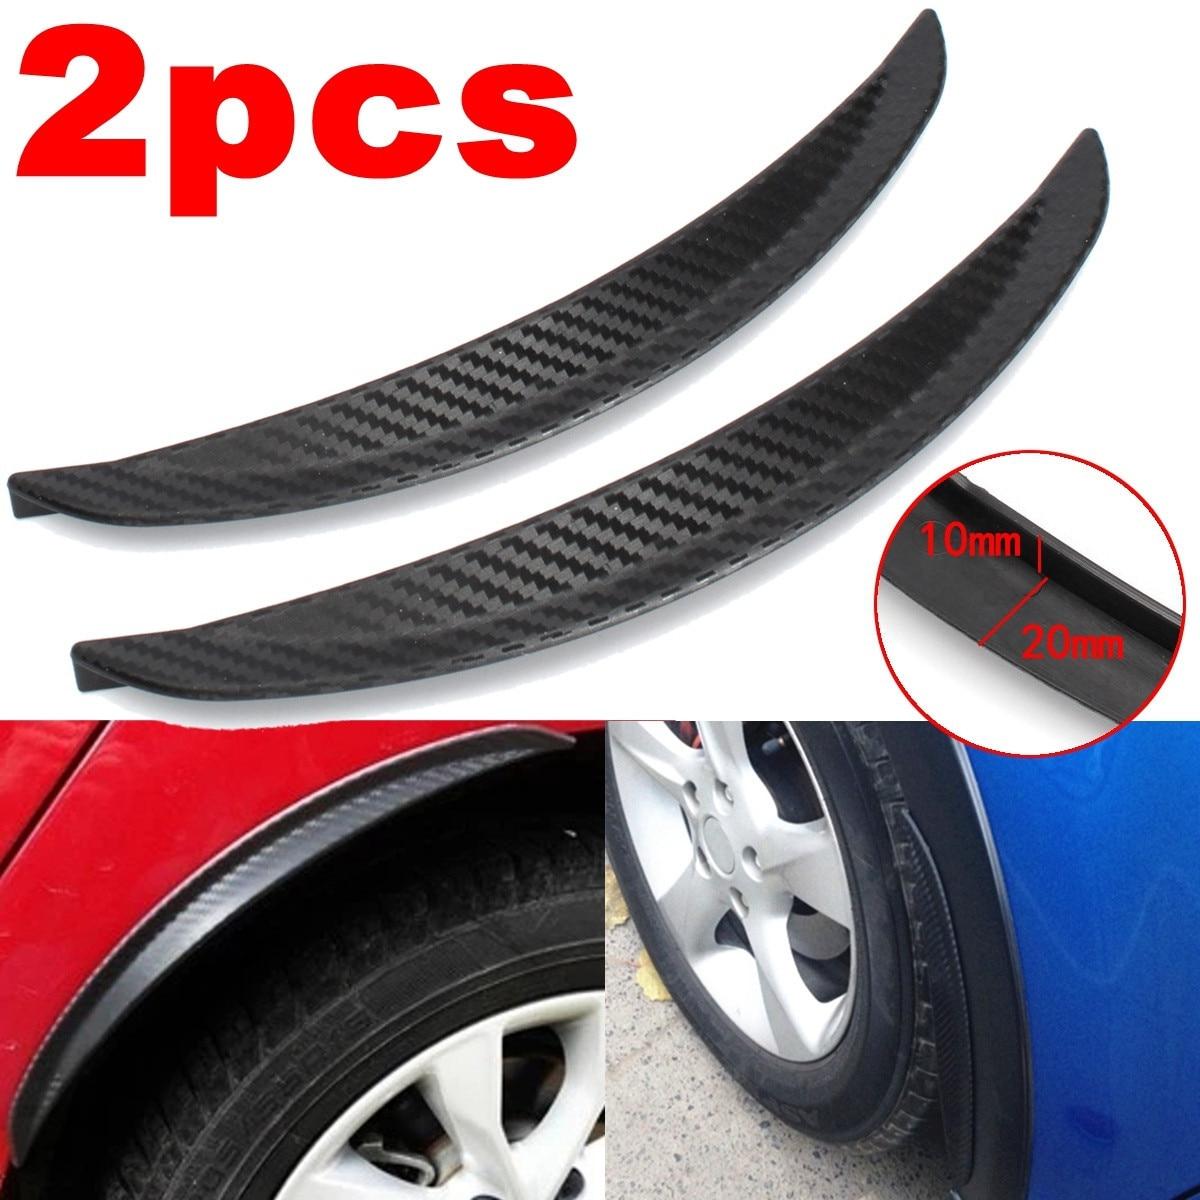 2pcs 24.5 ซม.คาร์บอนไฟเบอร์ Fender Flares Mud Flaps Splash Guards Arch ล้อคิ้วสำหรับรถยนต์รถบรรทุก SUV